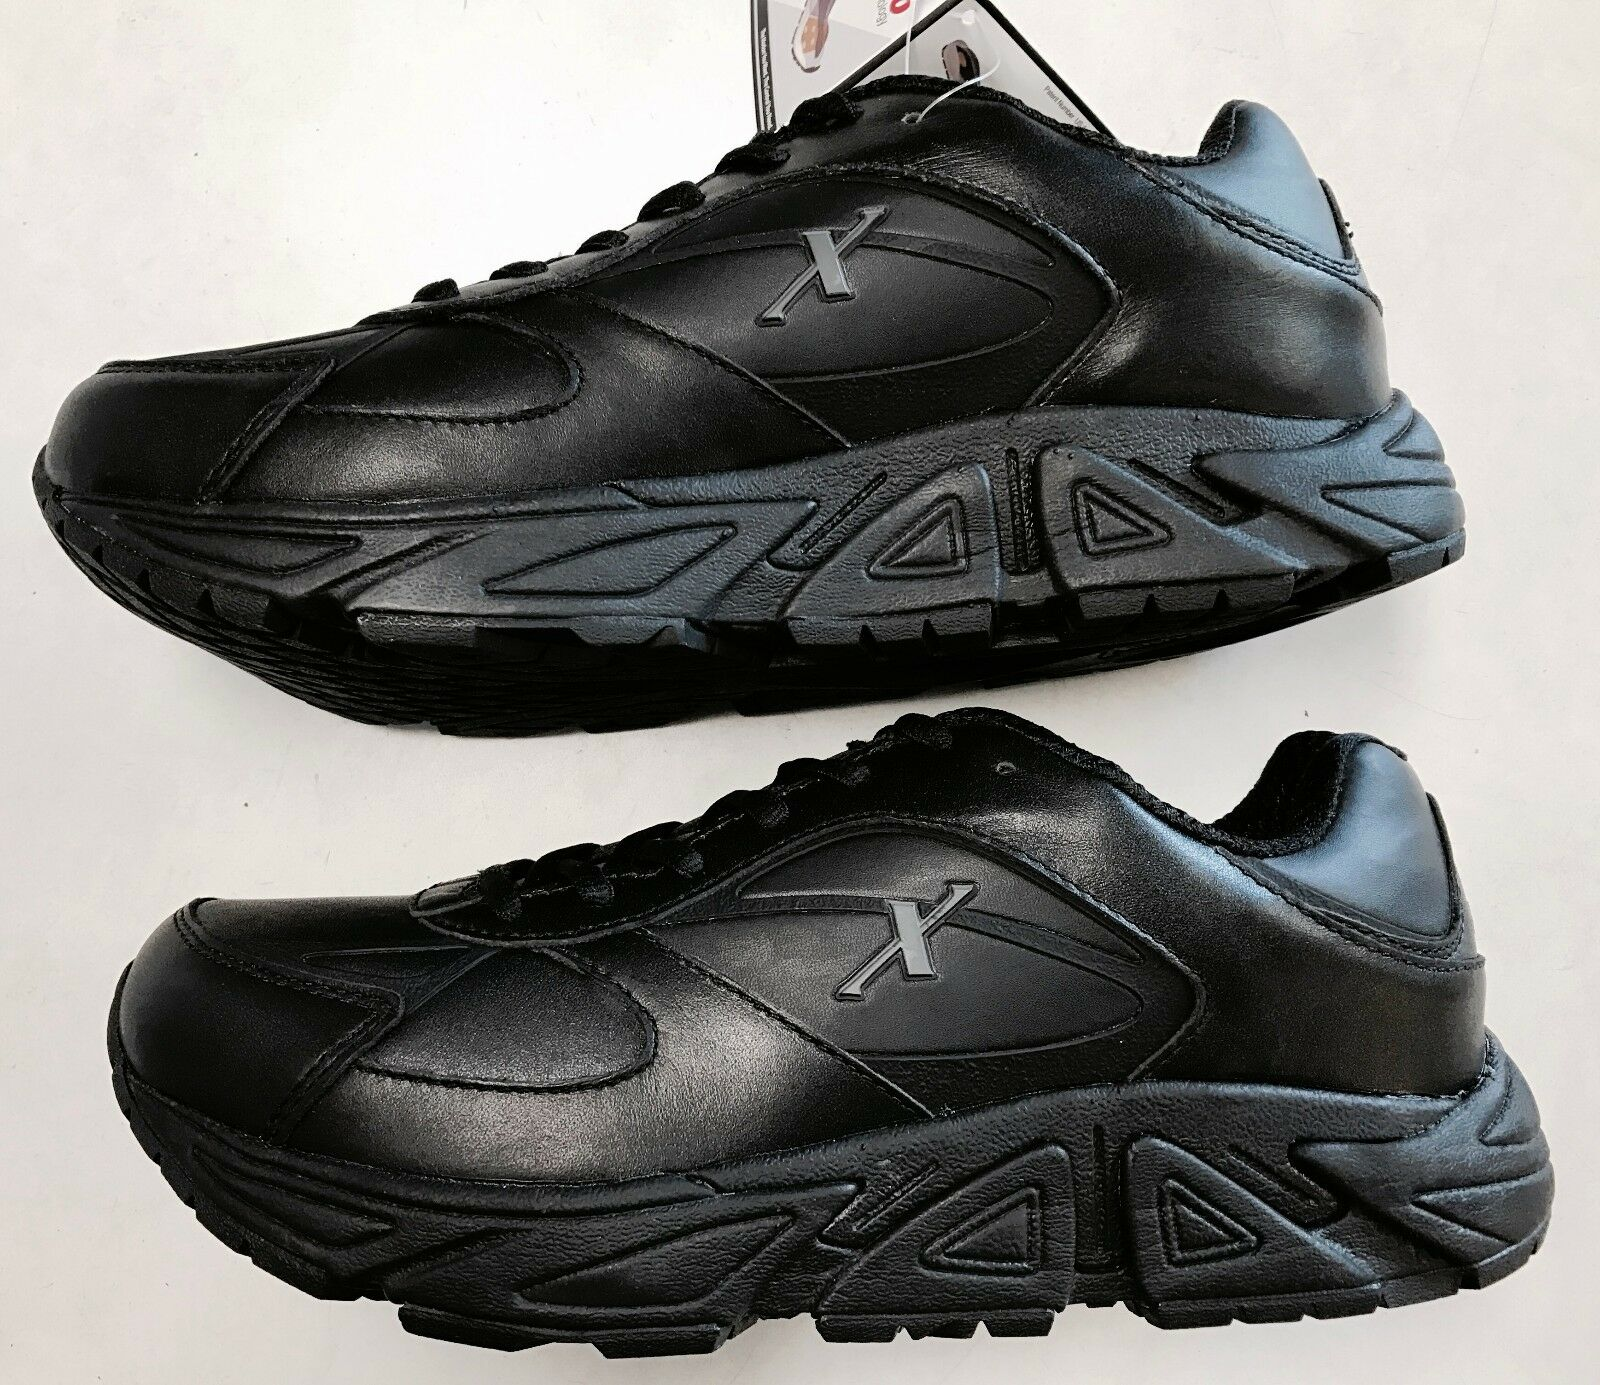 Xelero Genesis Men's Comfort Therapeutic Black All Leather Walking Sneakers- NIB